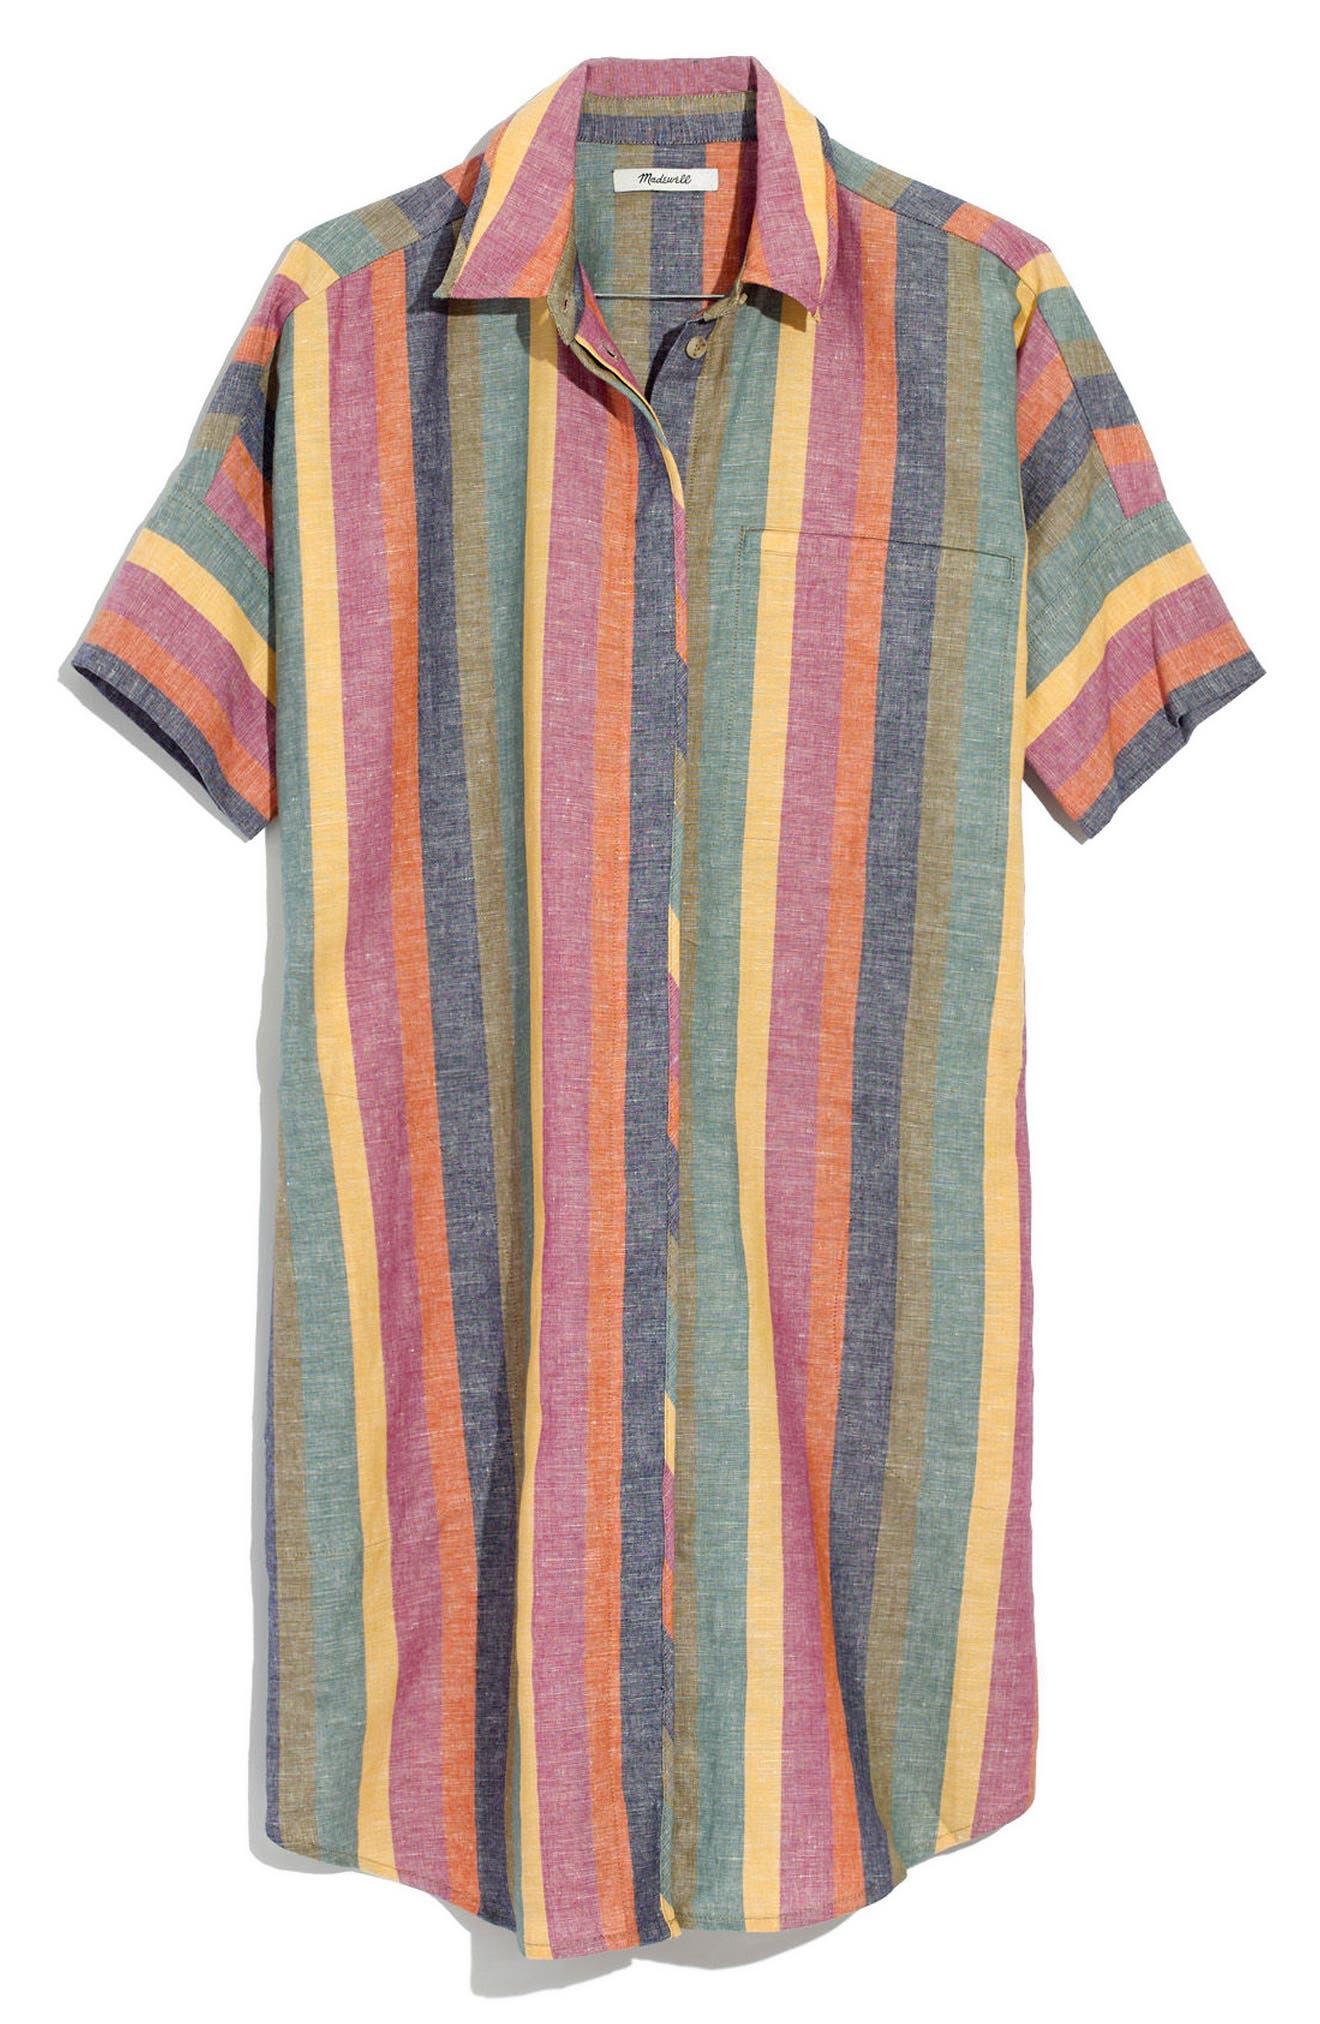 MADEWELL,                             Courier Rainbow Stripe Linen & Cotton Shirtdress,                             Alternate thumbnail 3, color,                             401